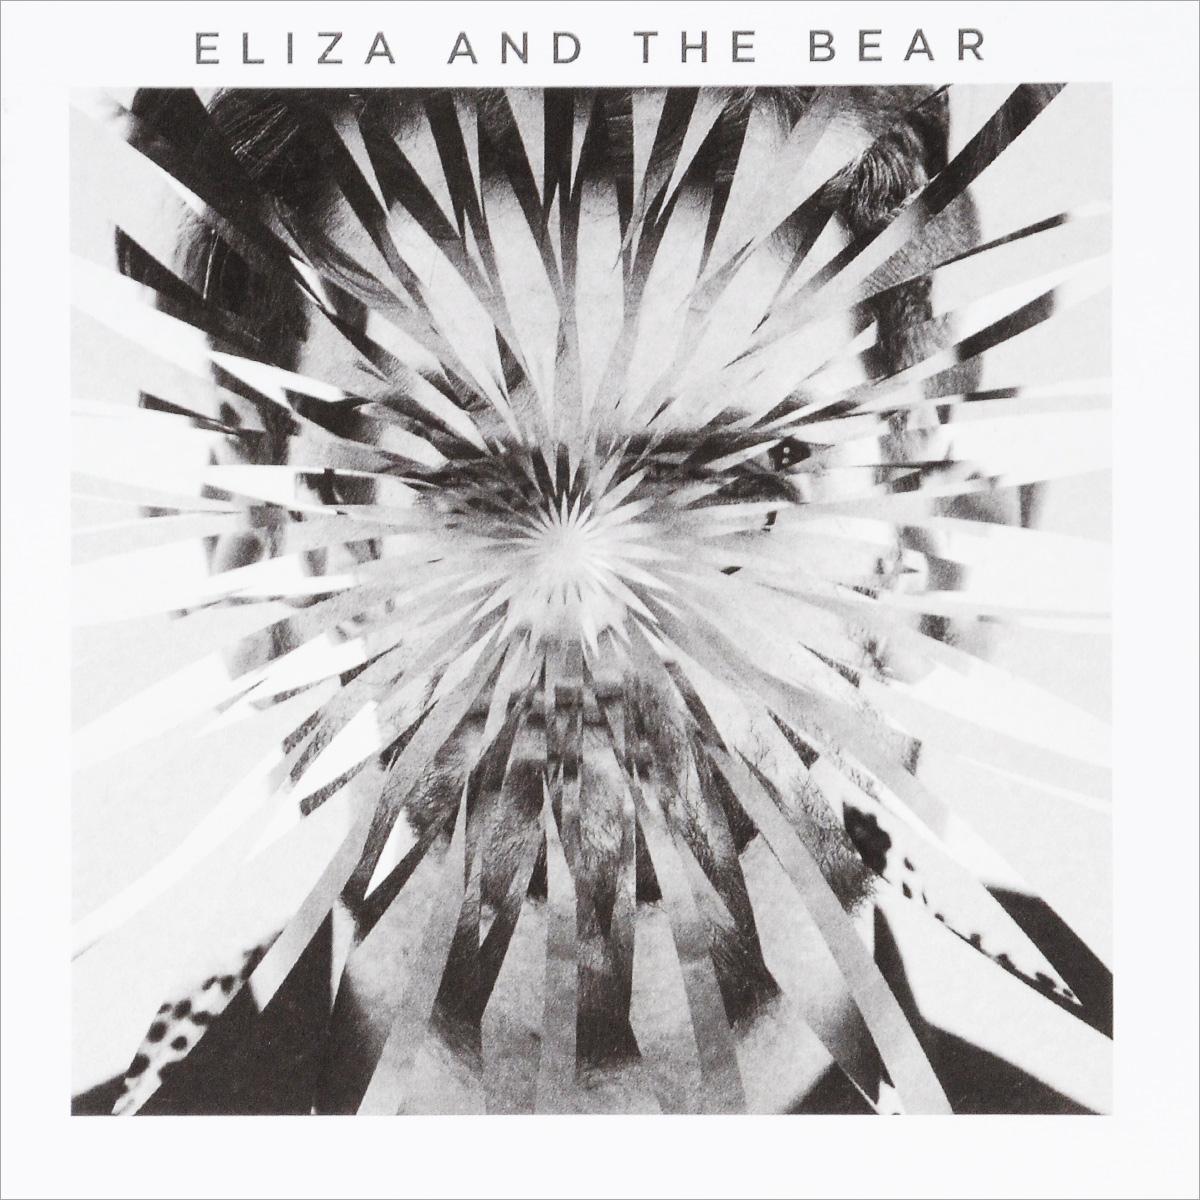 Eliza And The Bear Eliza And The Bear. Eliza And The Bear sara eliza wiltse myths and motherplays